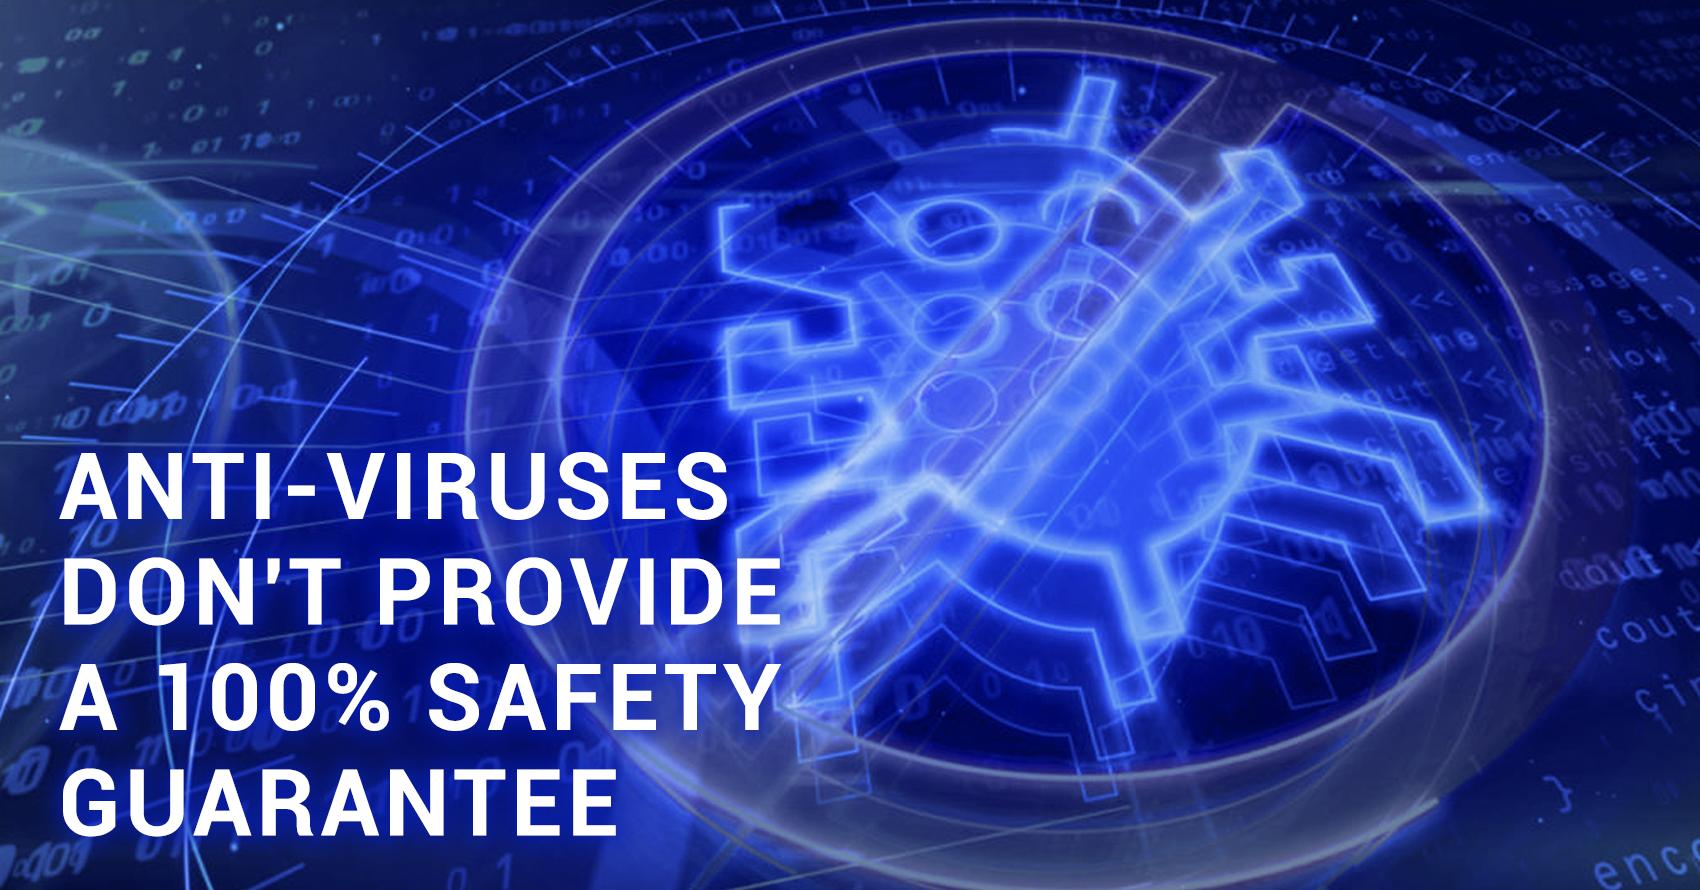 Anti-viruses don't provide a 100% website security guarantee